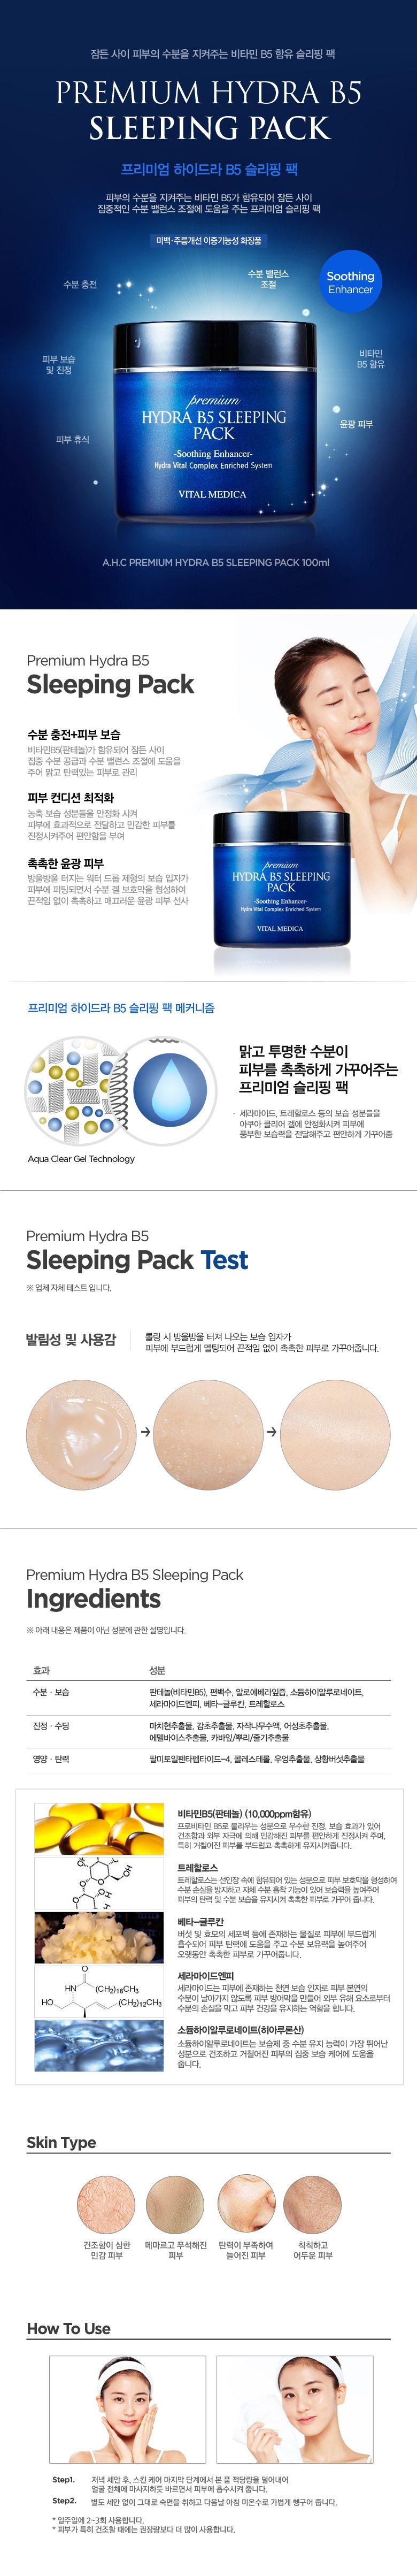 AHC Premium Hydra B5 Sleeping Pack 100ml malaysia singapore indonesia